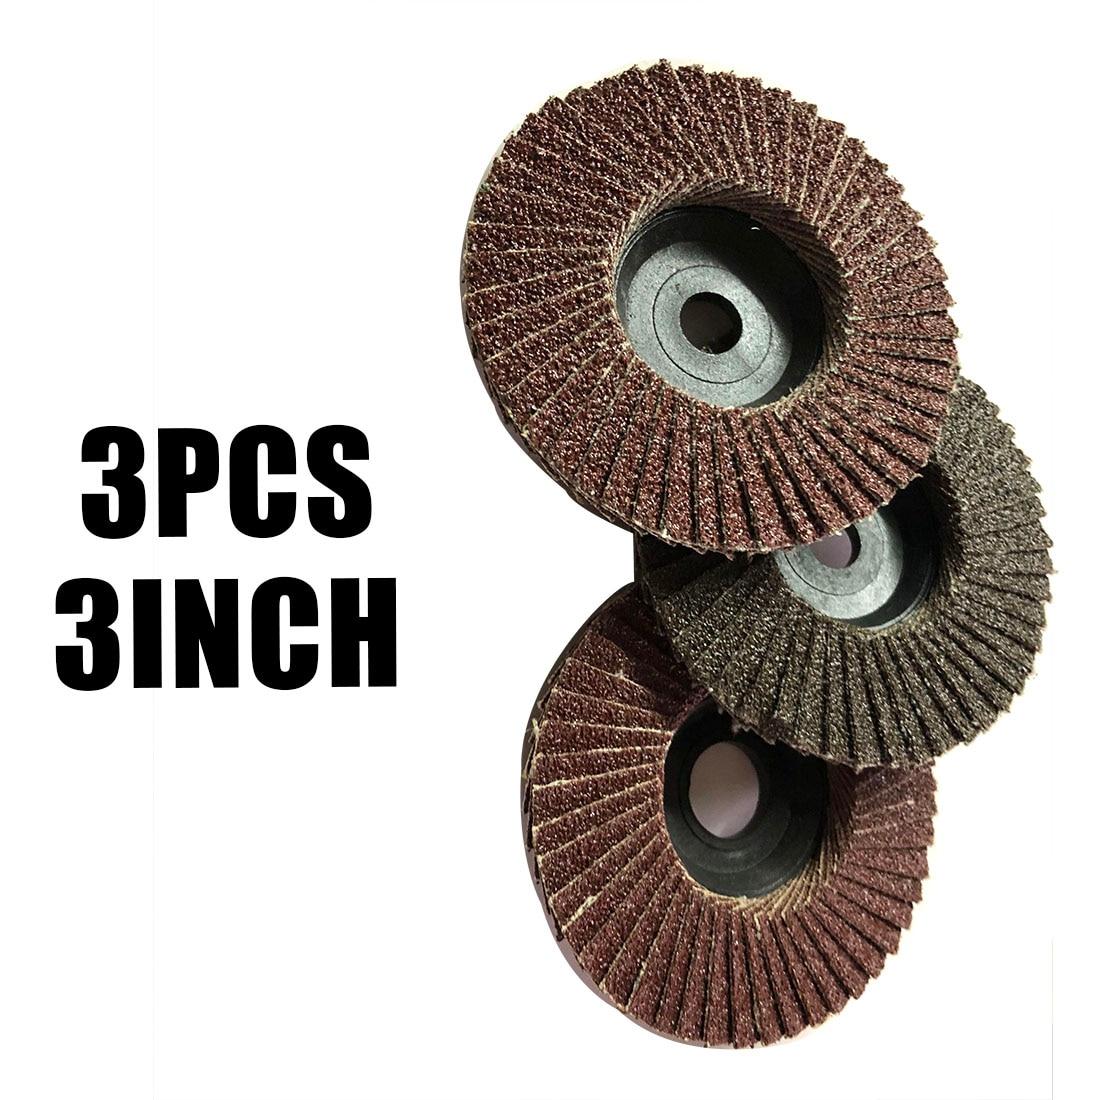 Sanding Flap Disc Wheel Angle Grinder Metal Grinding Cutting Detailing